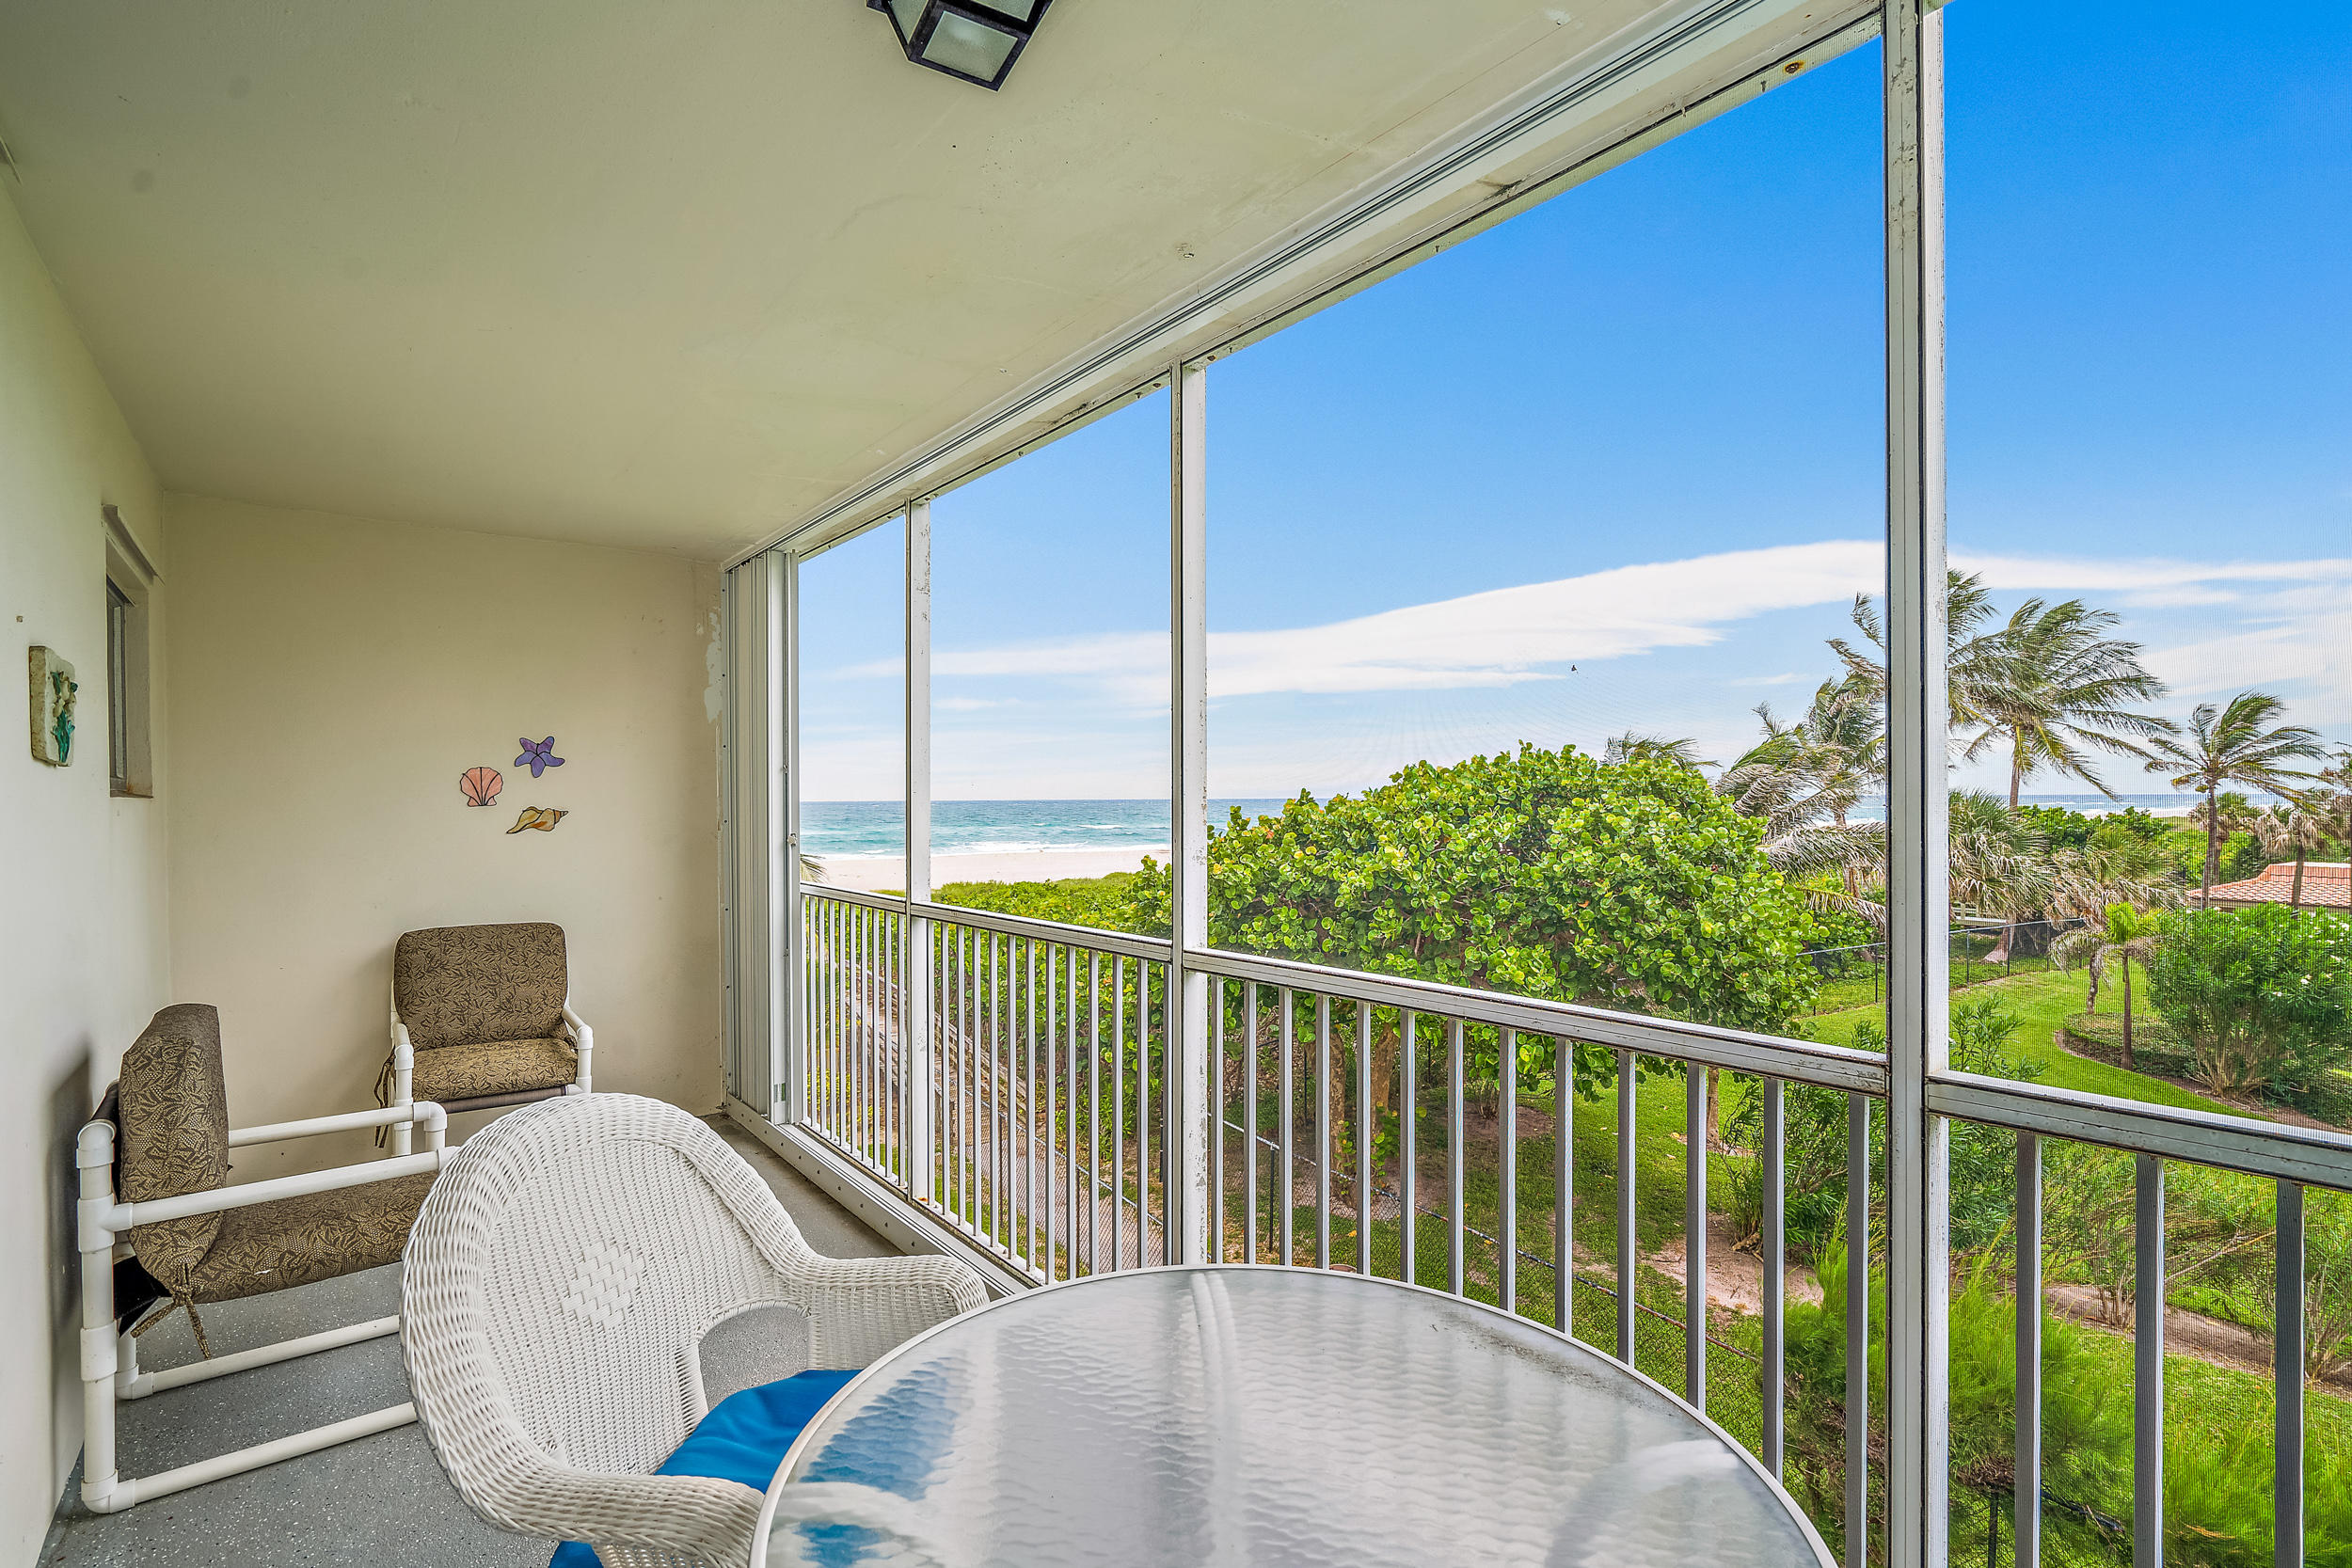 3600 N Ocean Unit 325, Singer Island, Florida 33404